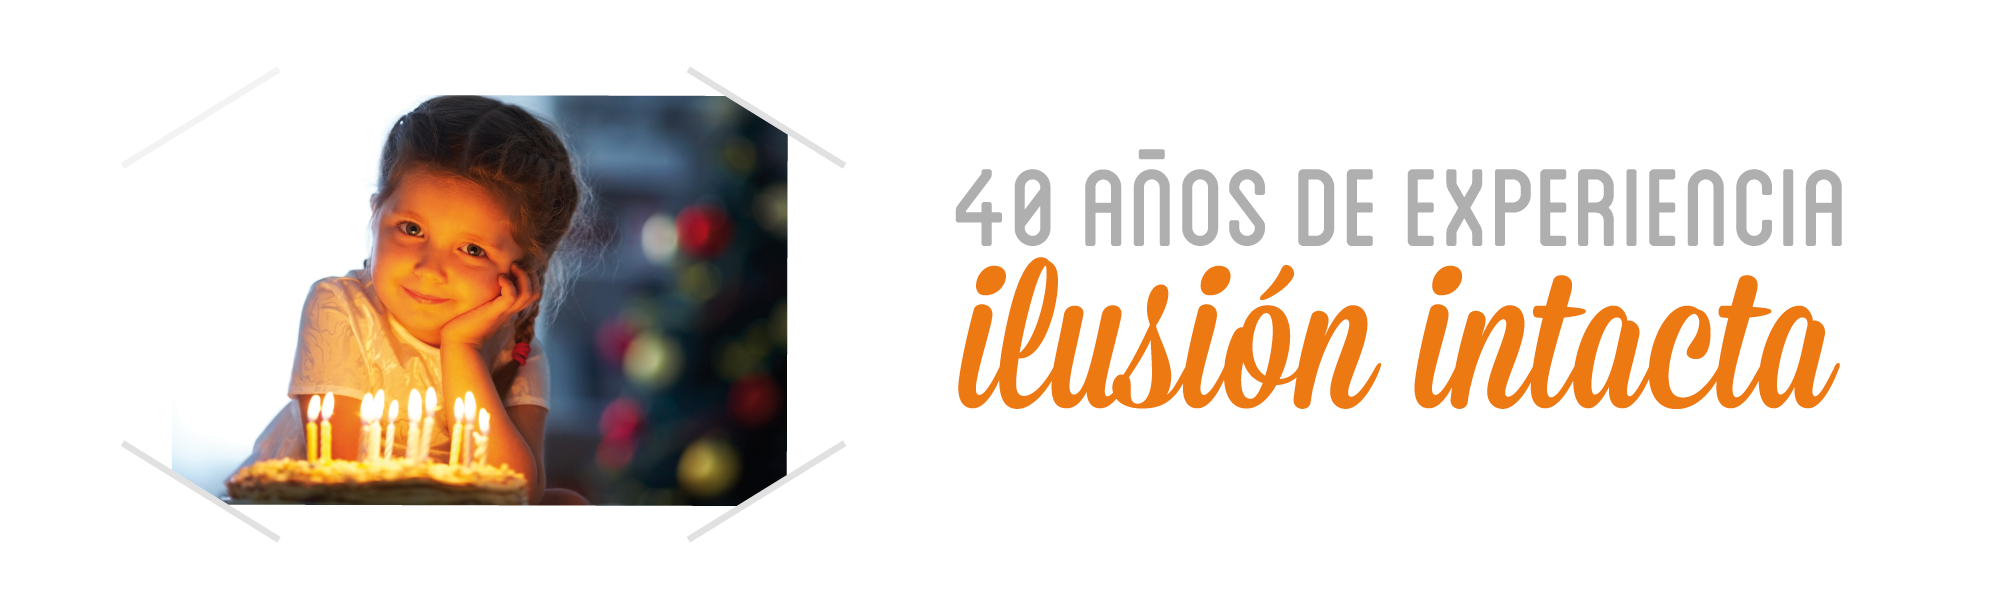 ilusion-intacta